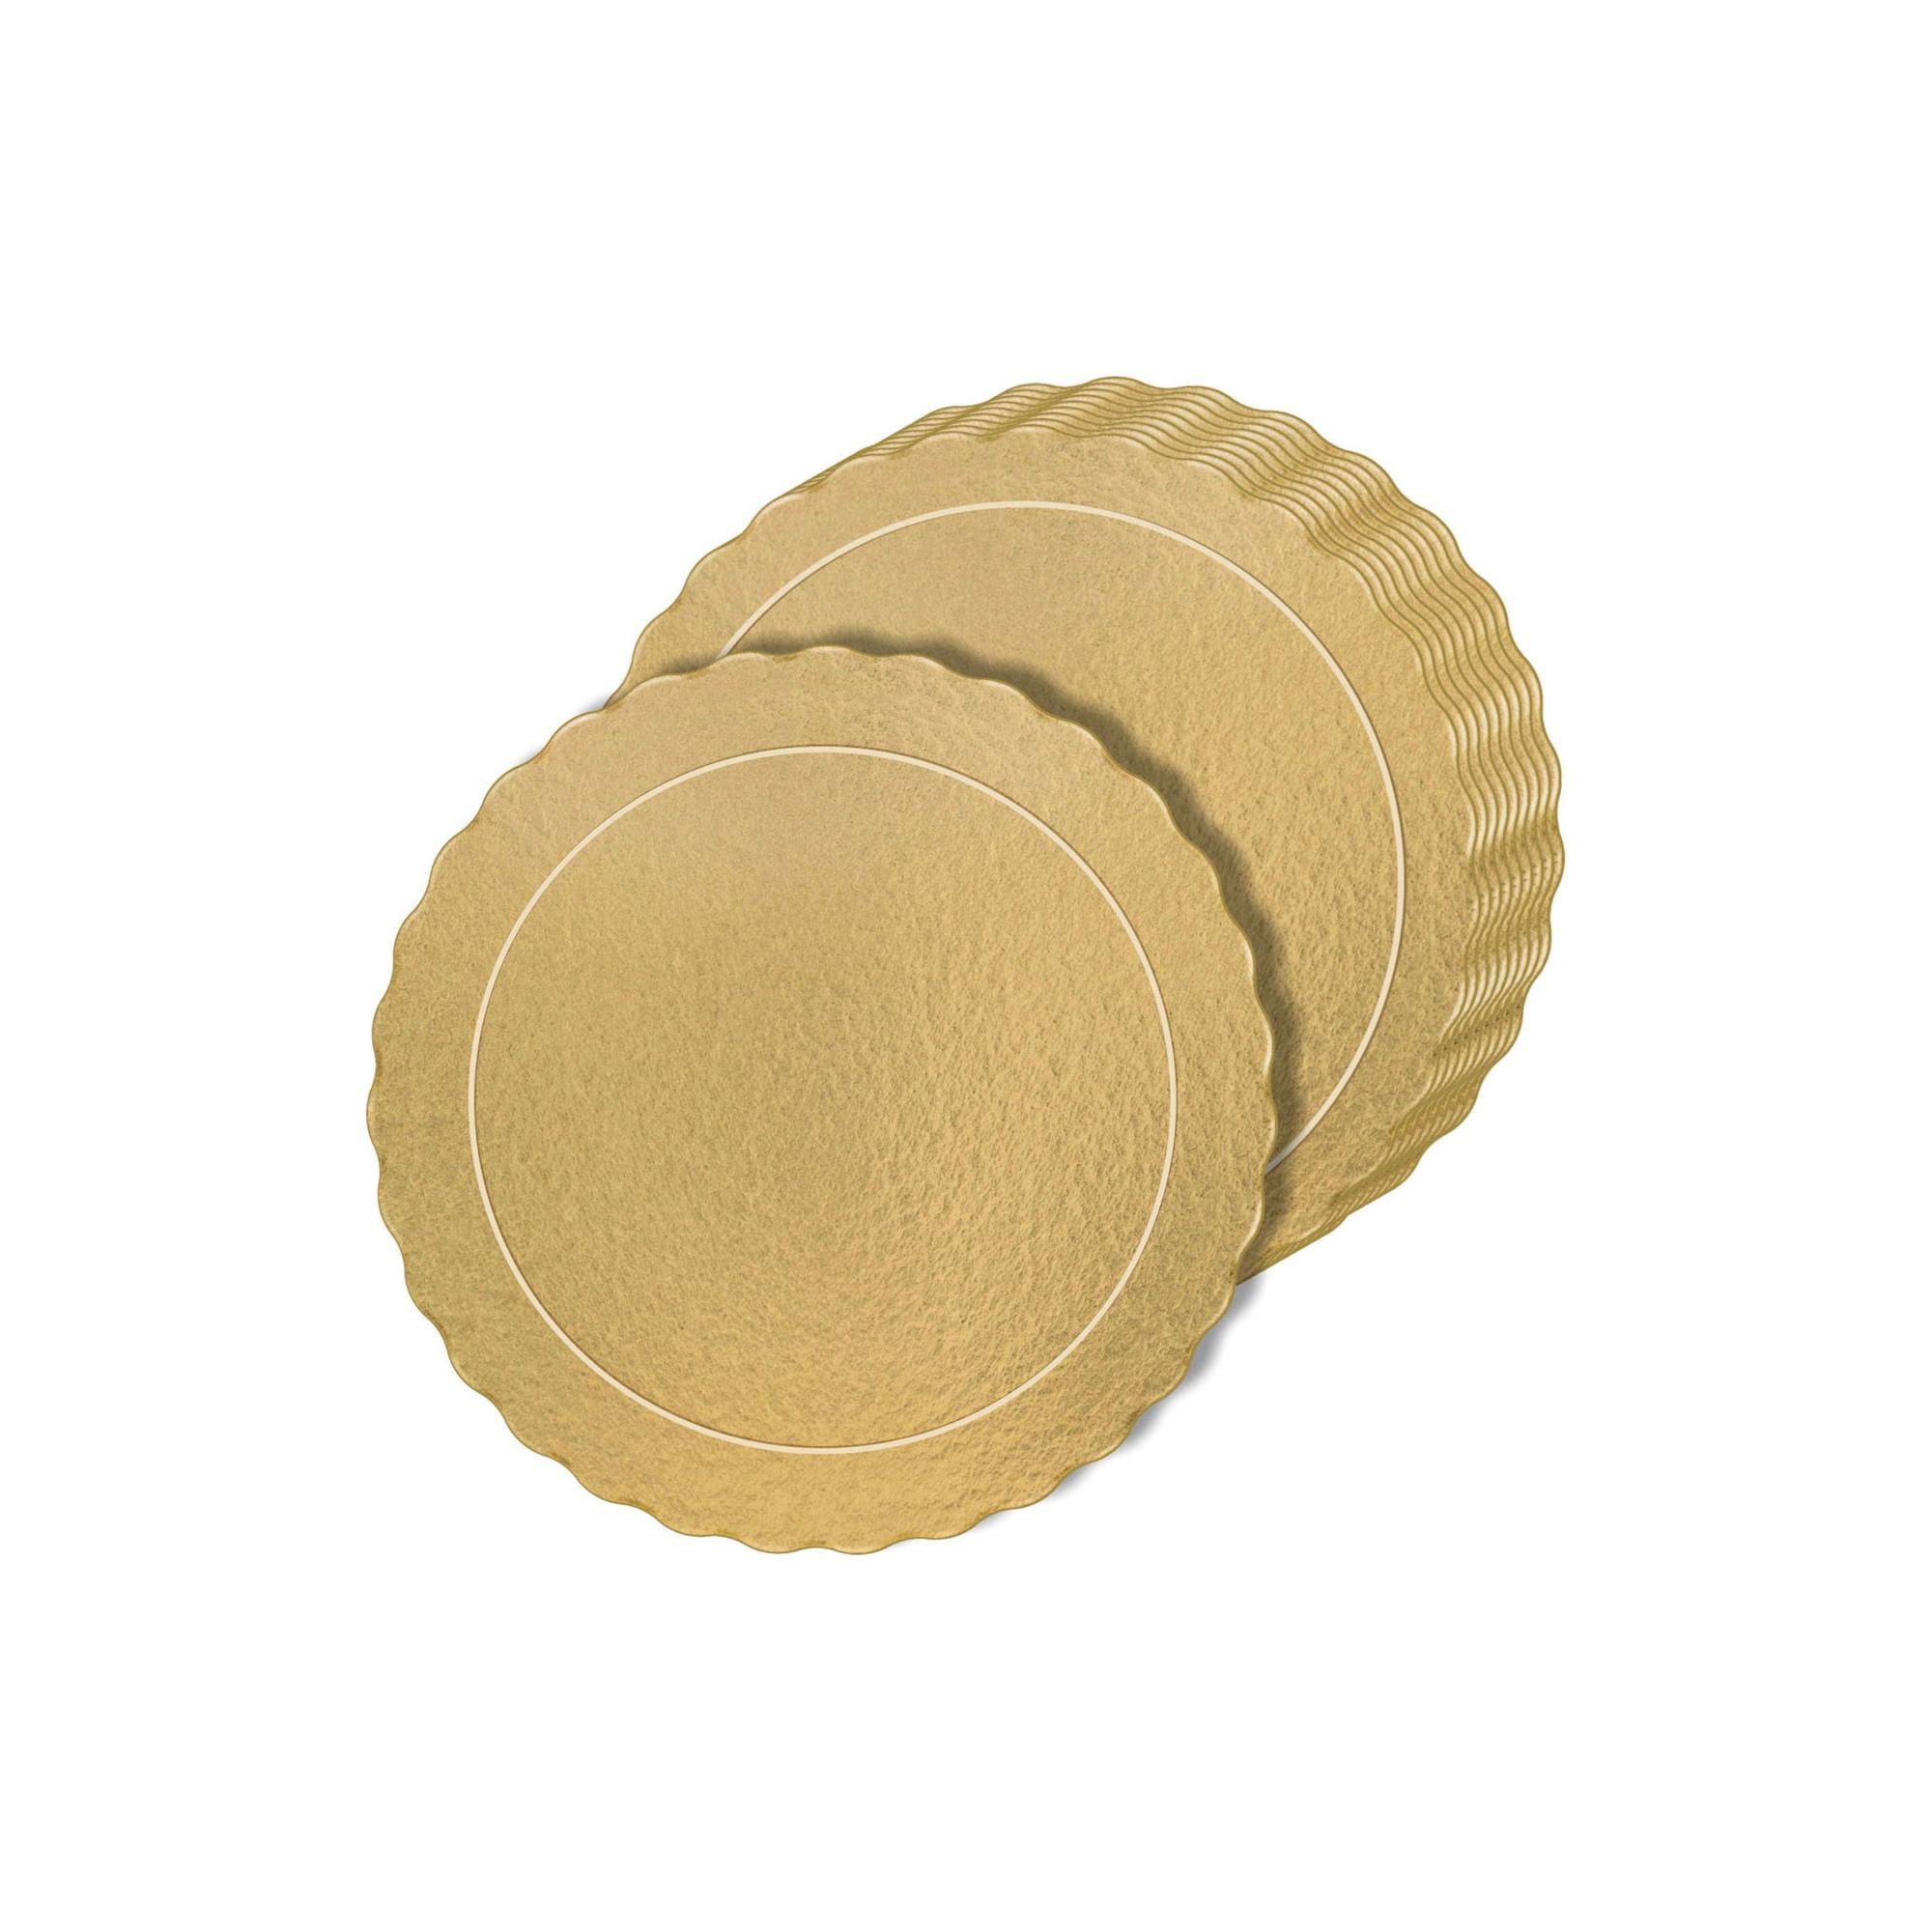 50 Bases Laminadas, Suporte P/ Bolo, Cake Board, Kit 20 e 24cm - Ouro